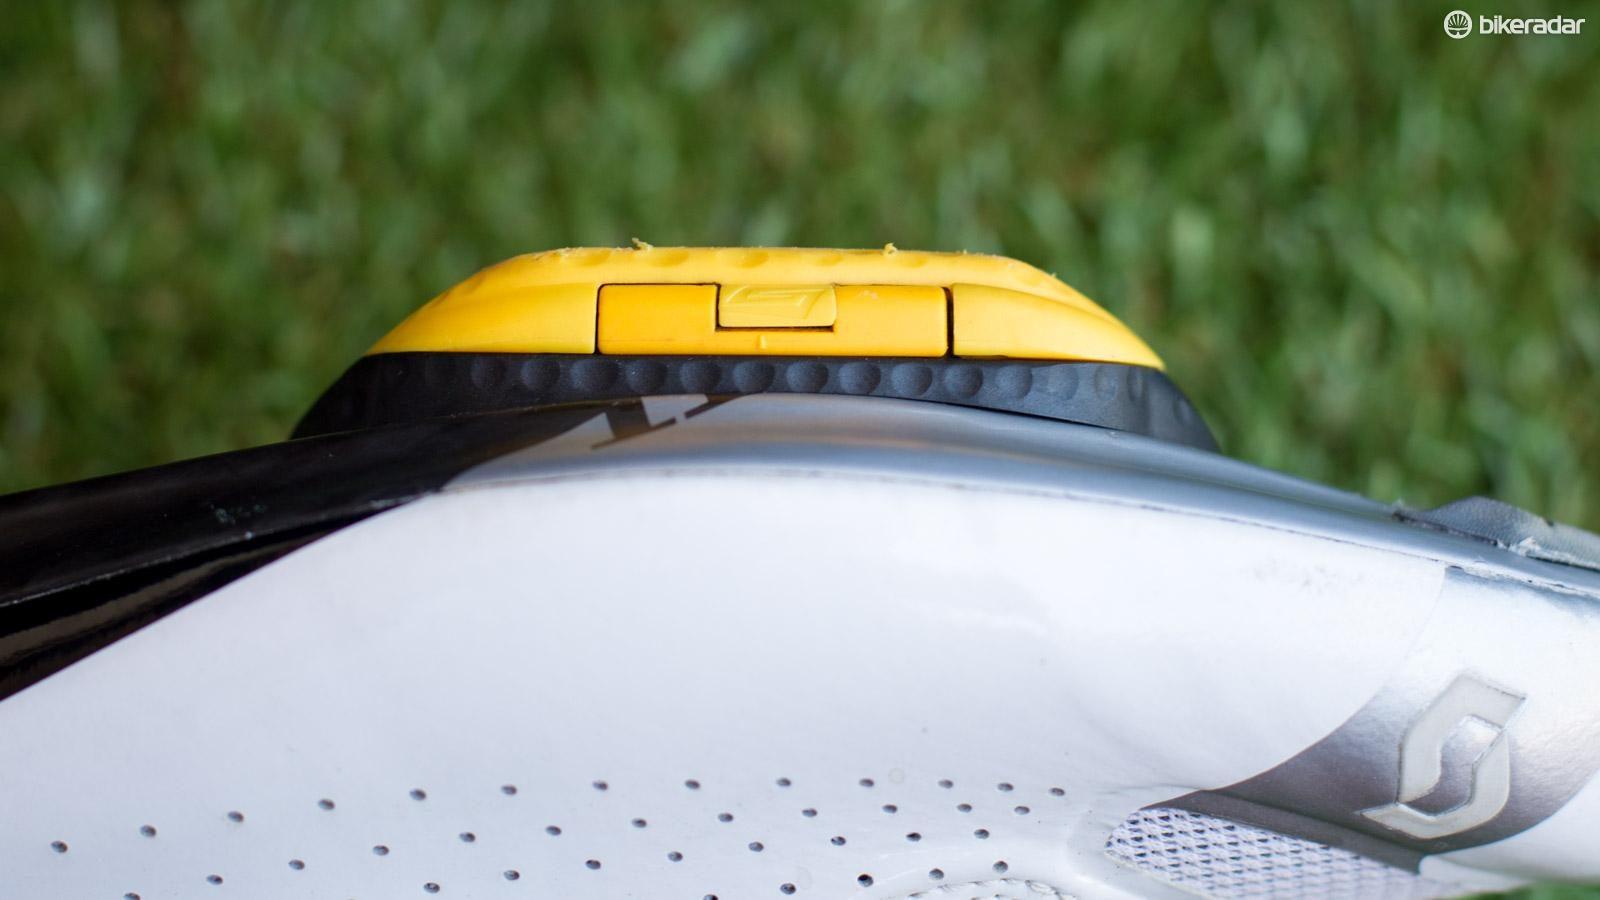 Speedplay Walkable Cleats review